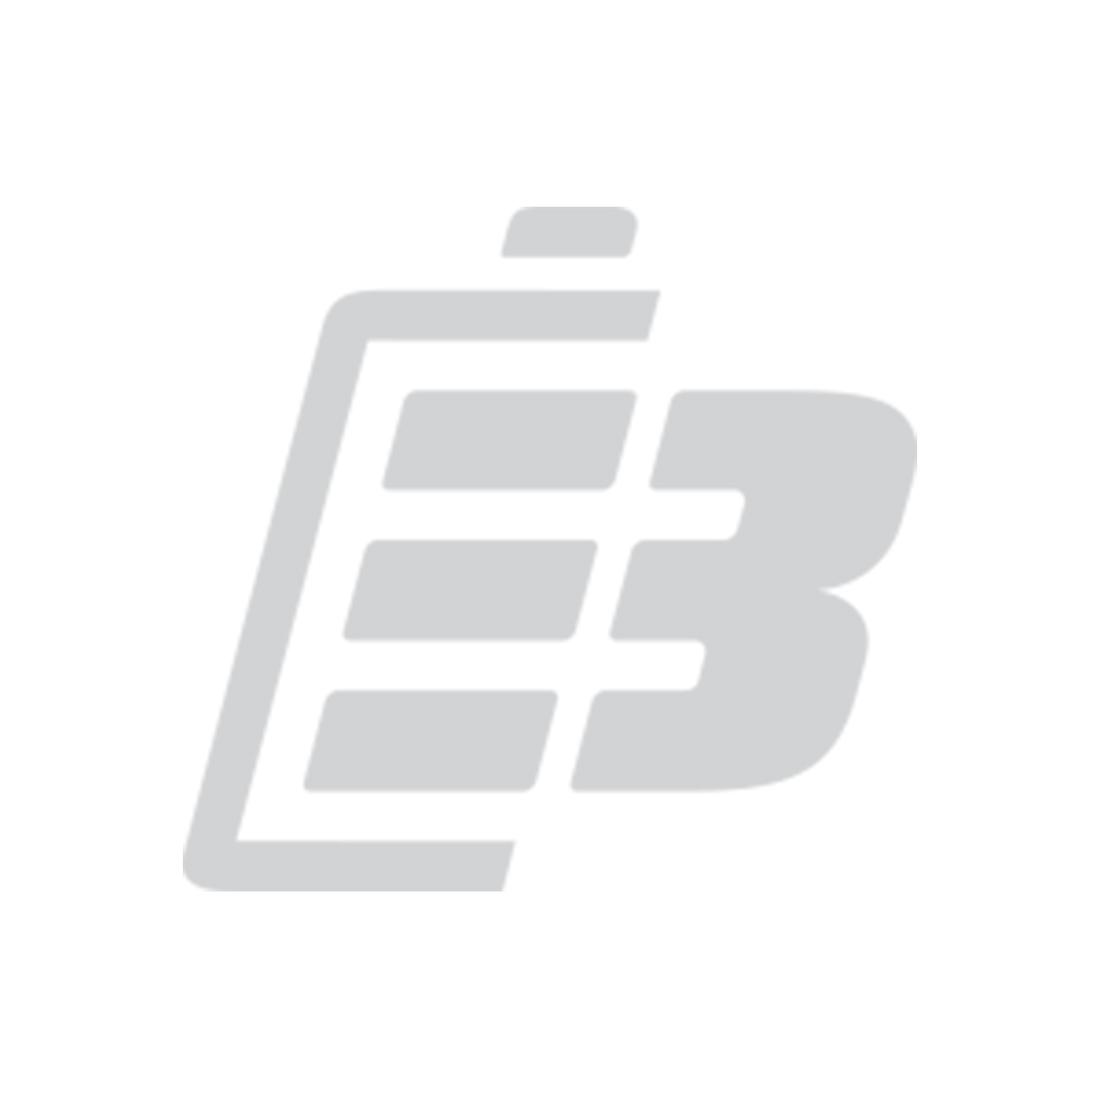 Laptop Battery Hp Pavilion Dv6000